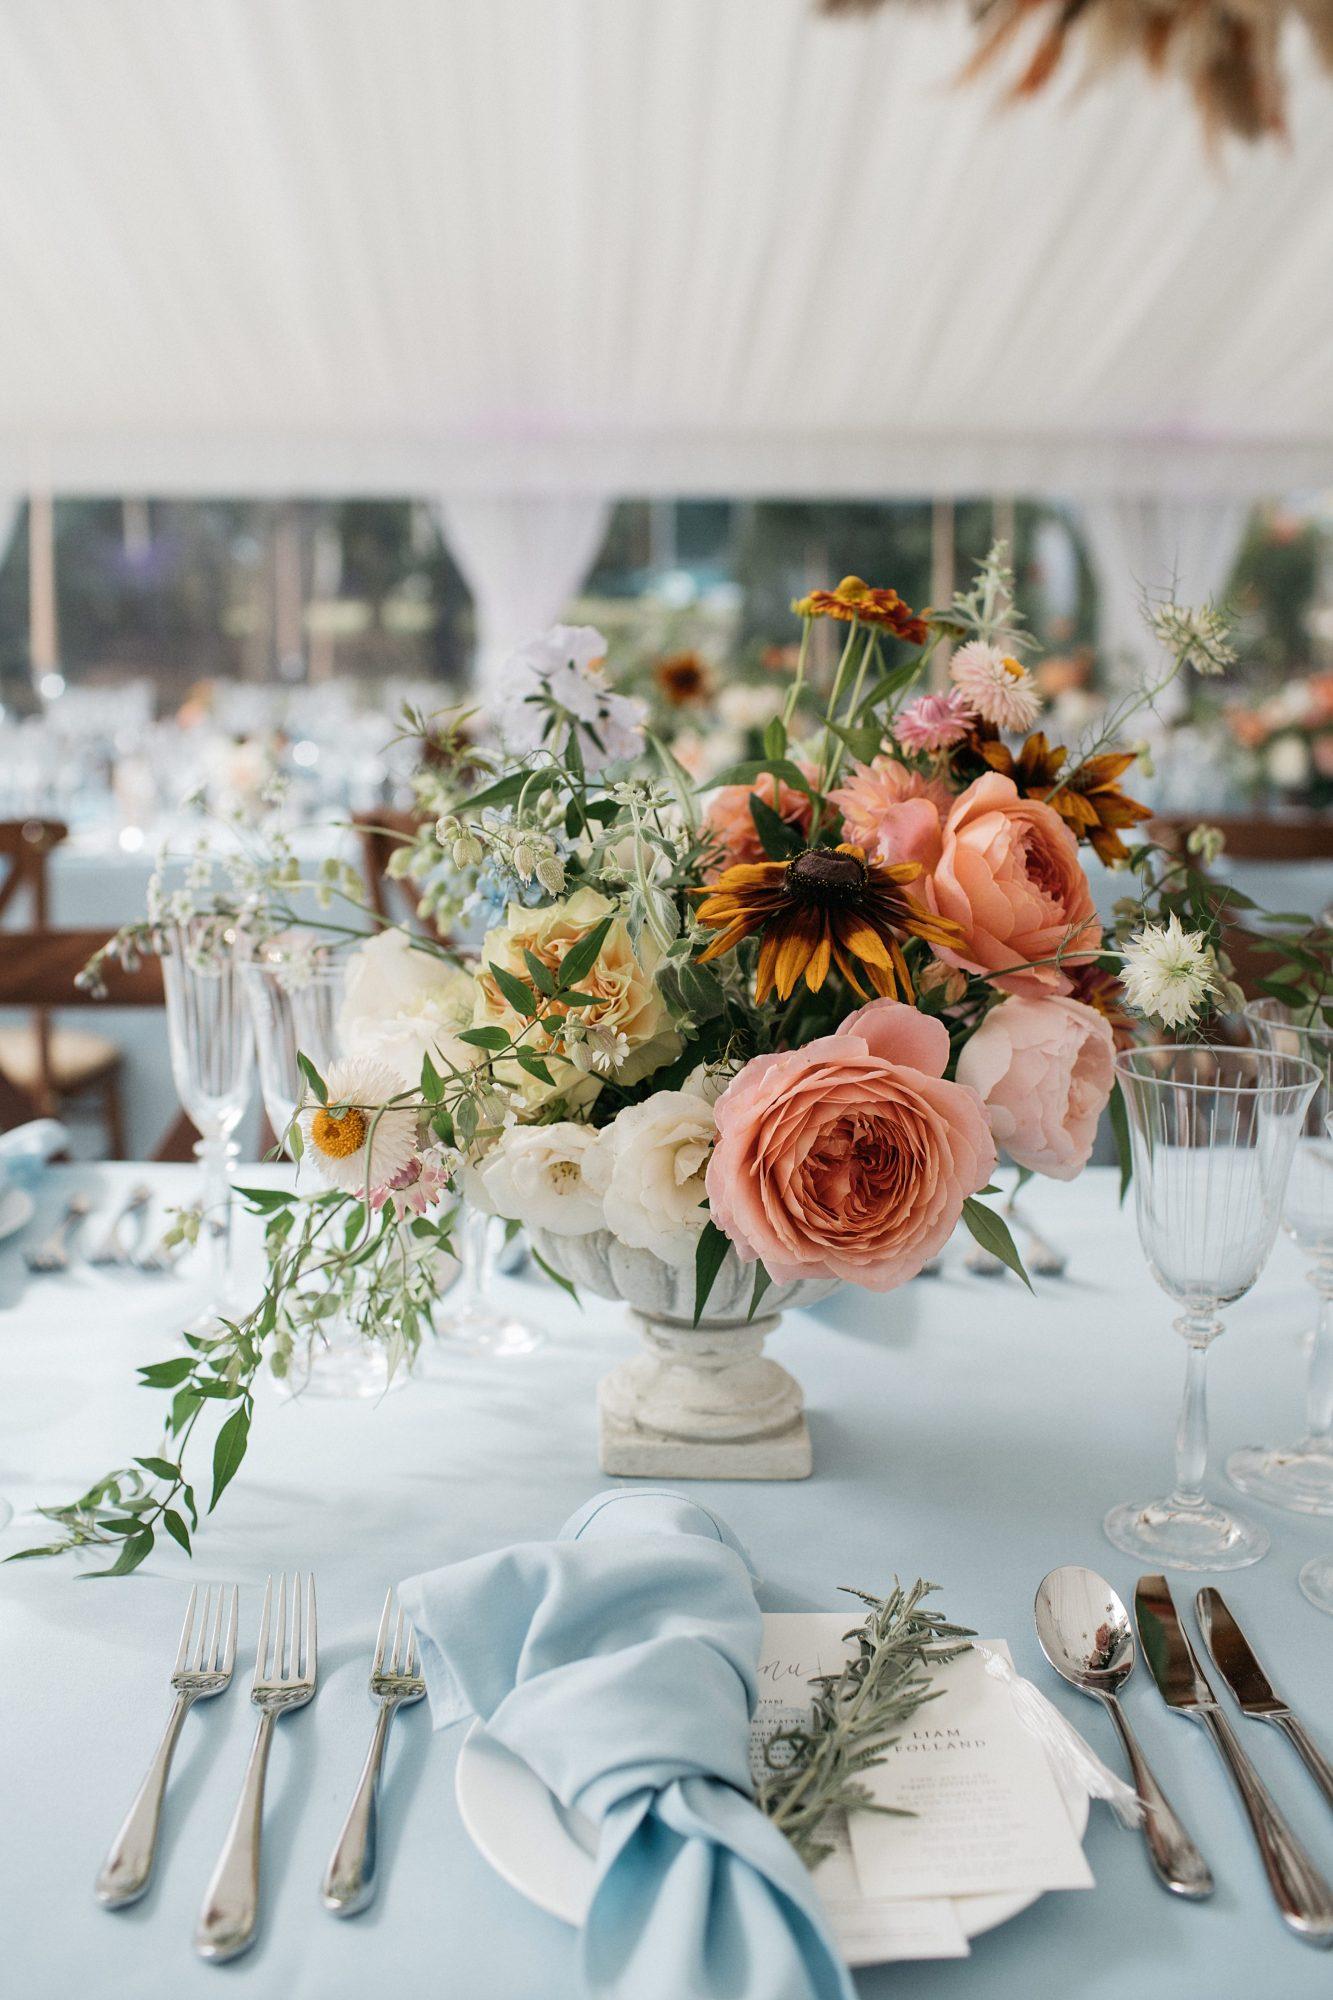 laurie lee wedding reception floral centerpieces